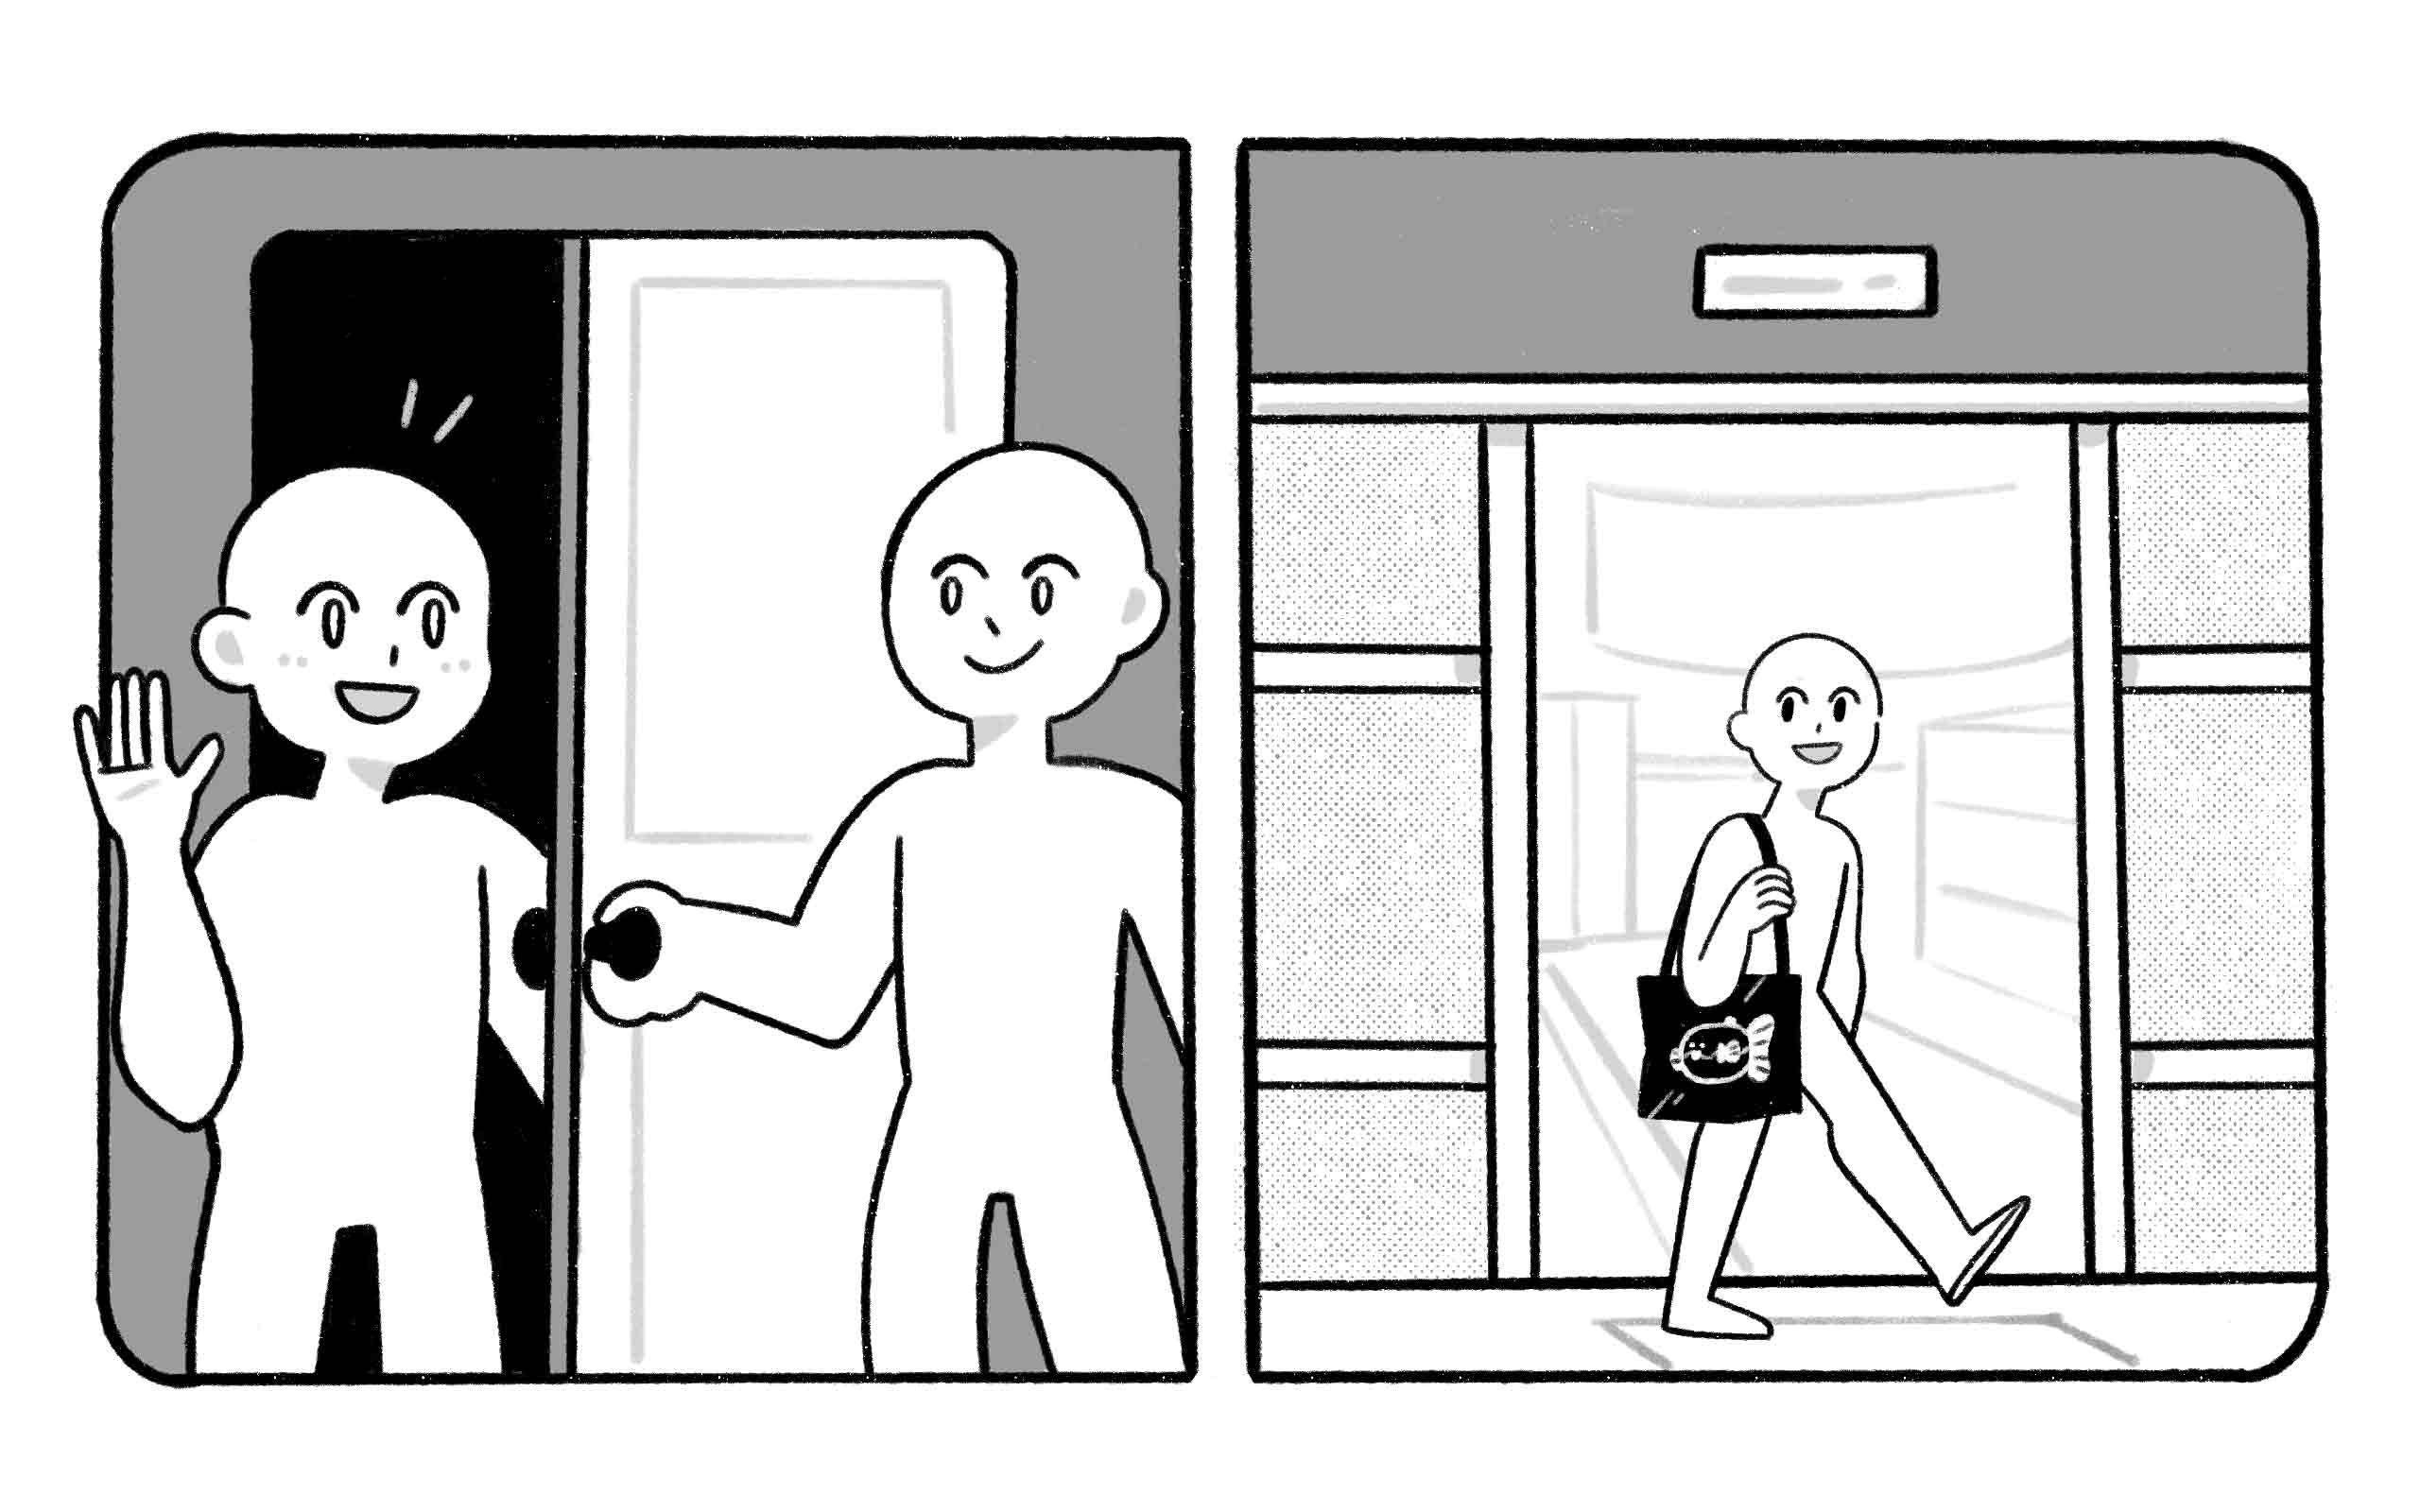 someone opens a door, and a door opens by itself